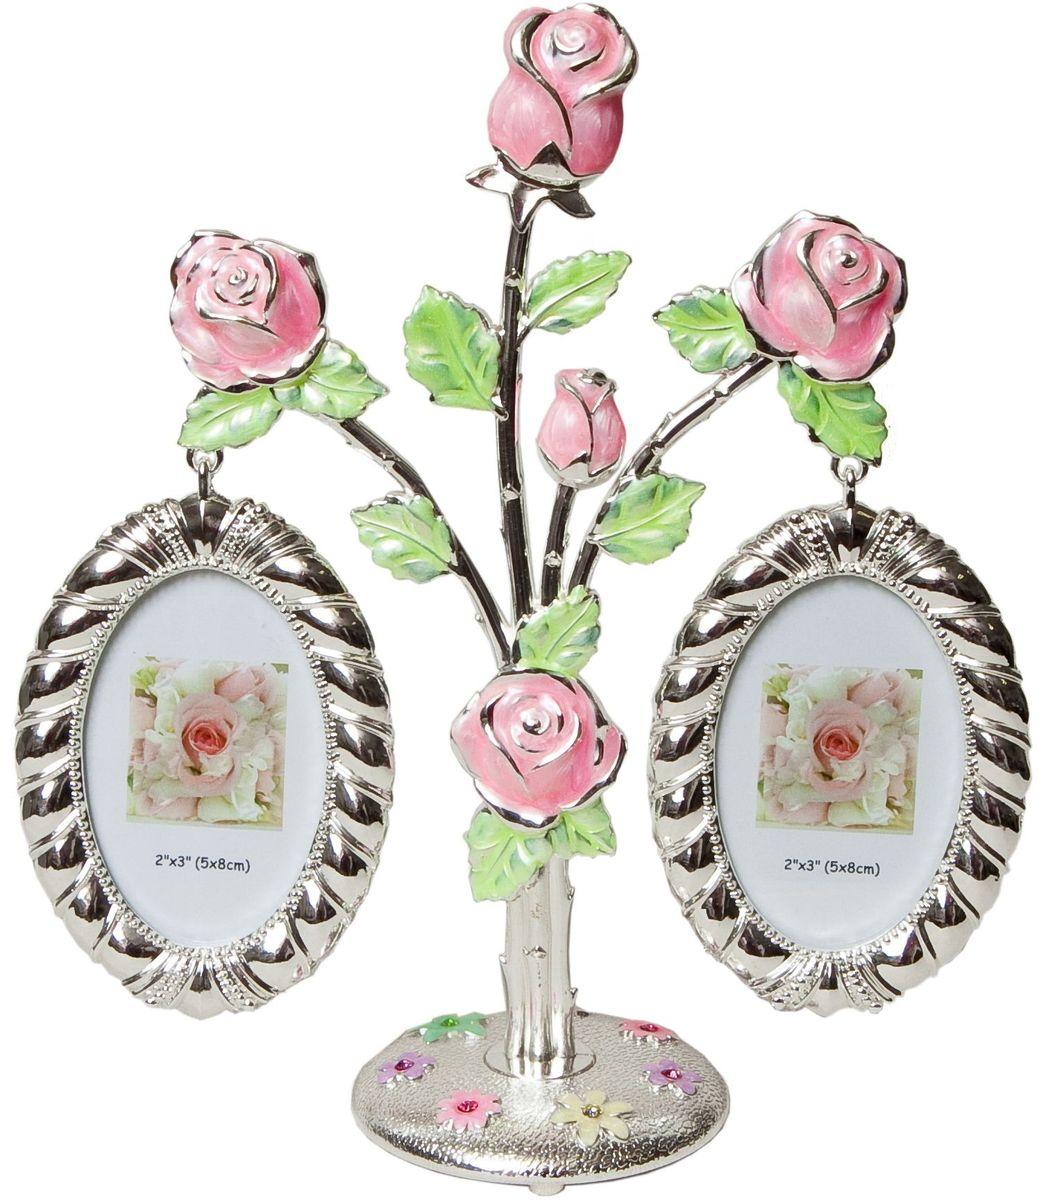 "Фоторамка Platinum ""Дерево. Цветы"", цвет: светло-серый, на 2 фото, 5 x 8 см. PF9675AP 2 фоторамки на дереве PF9675AP"